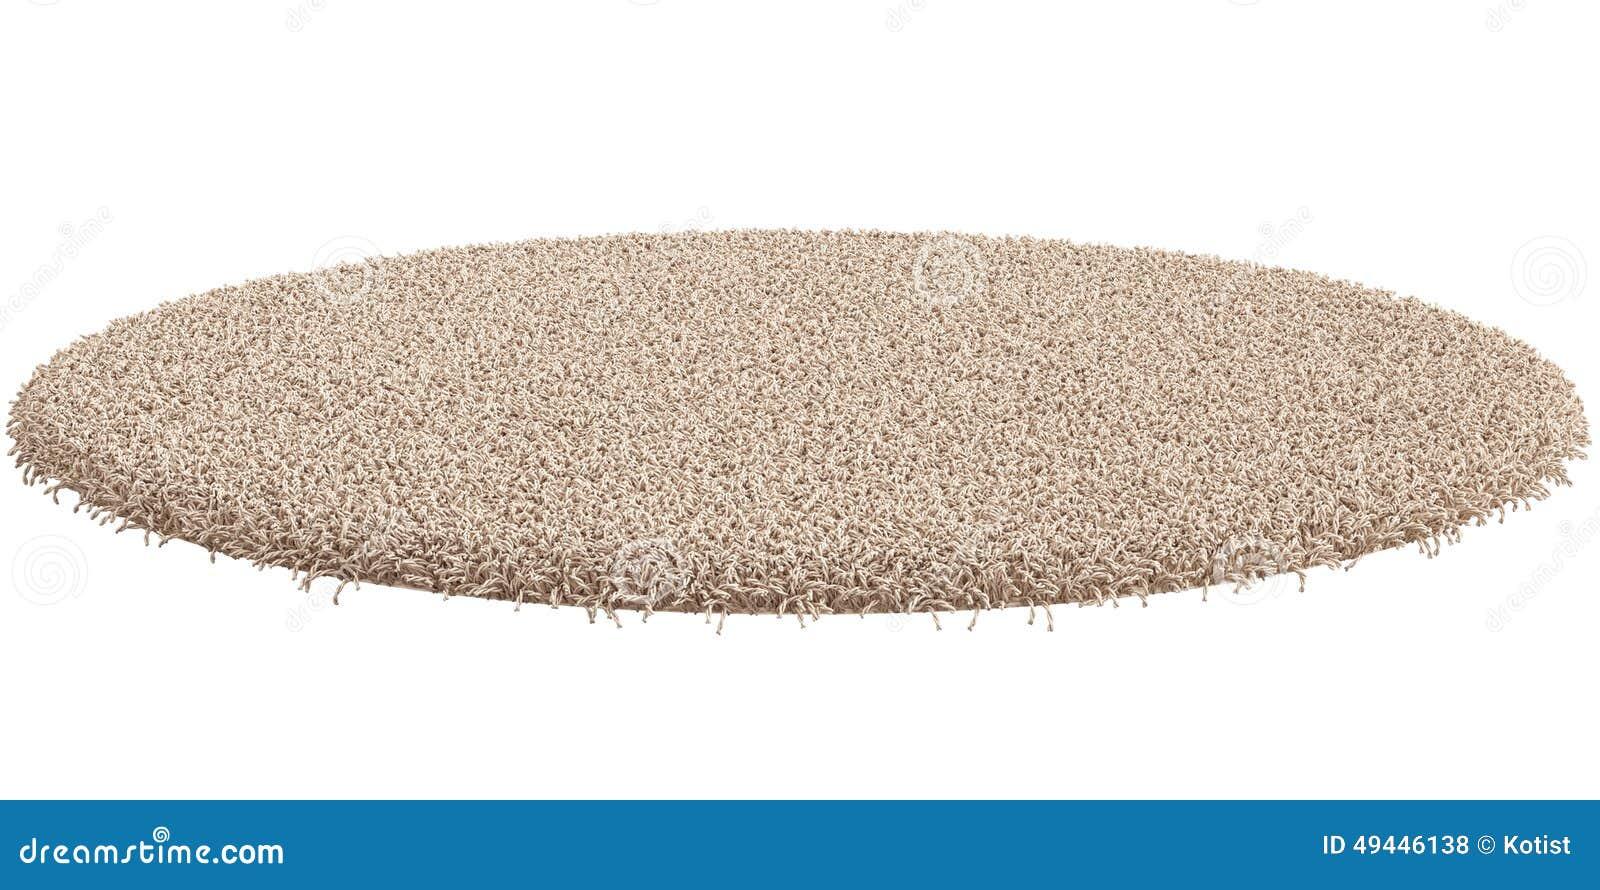 white carpet background. round carpet isolated on white background royalty free stock photos